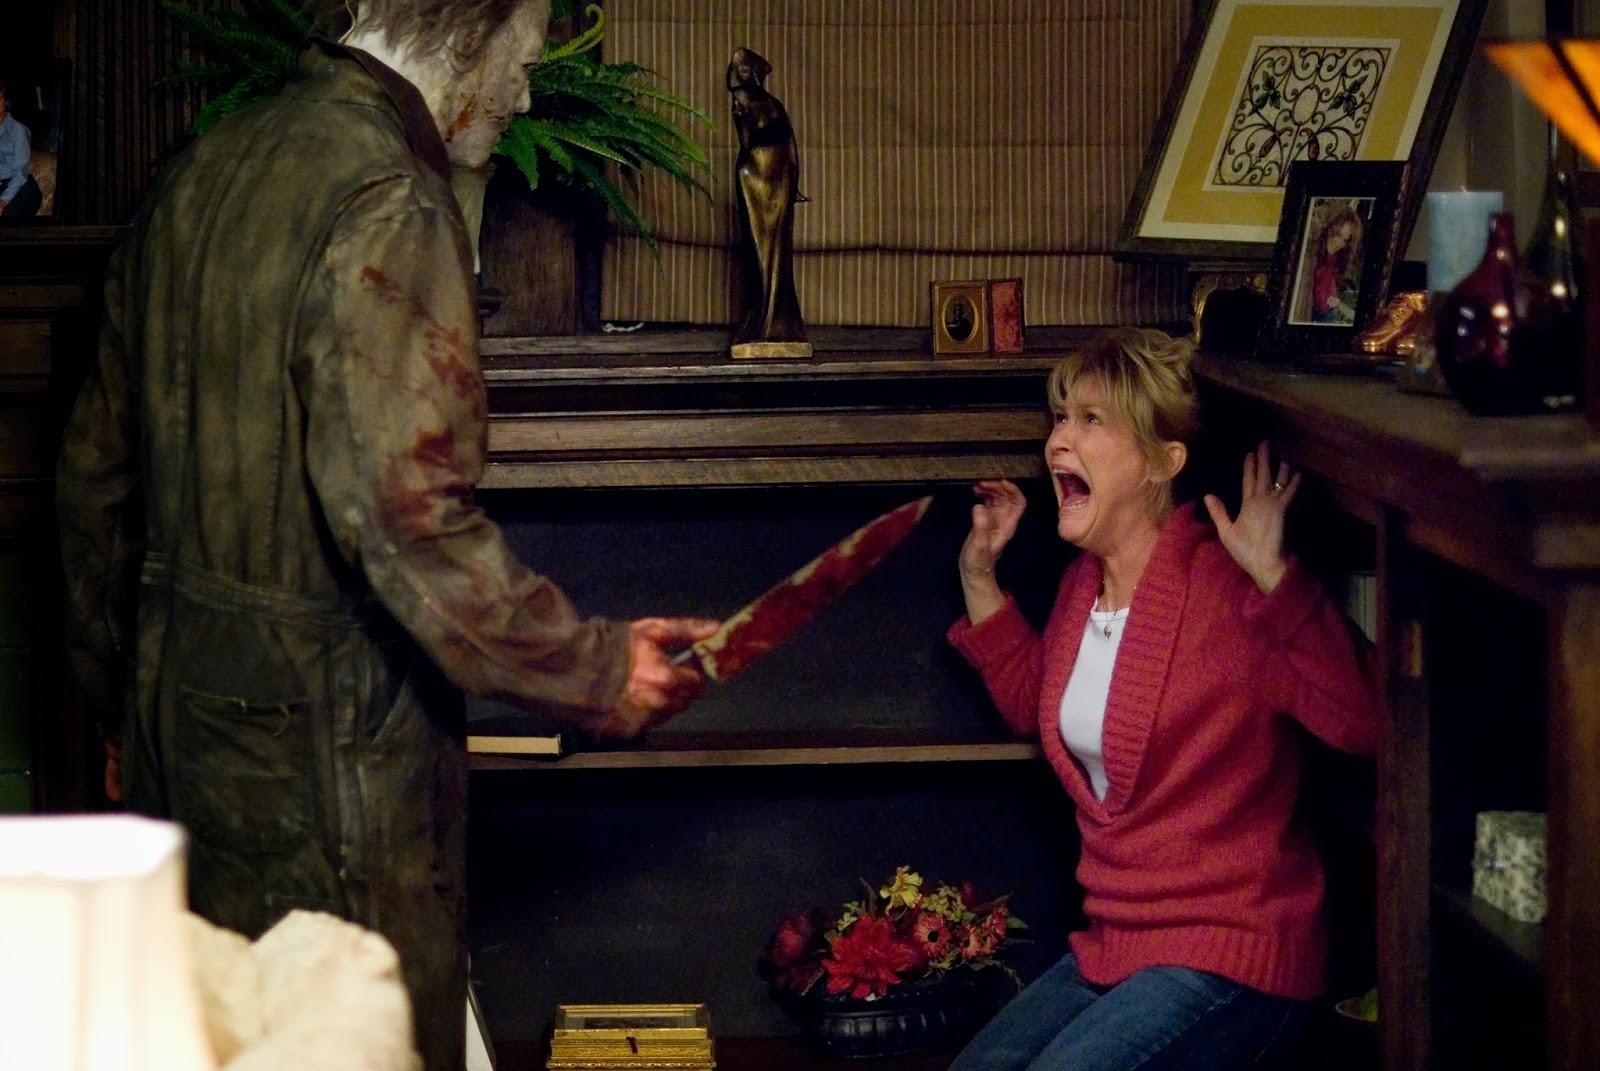 The Last Reel: The Sins Of Zombie's Halloween